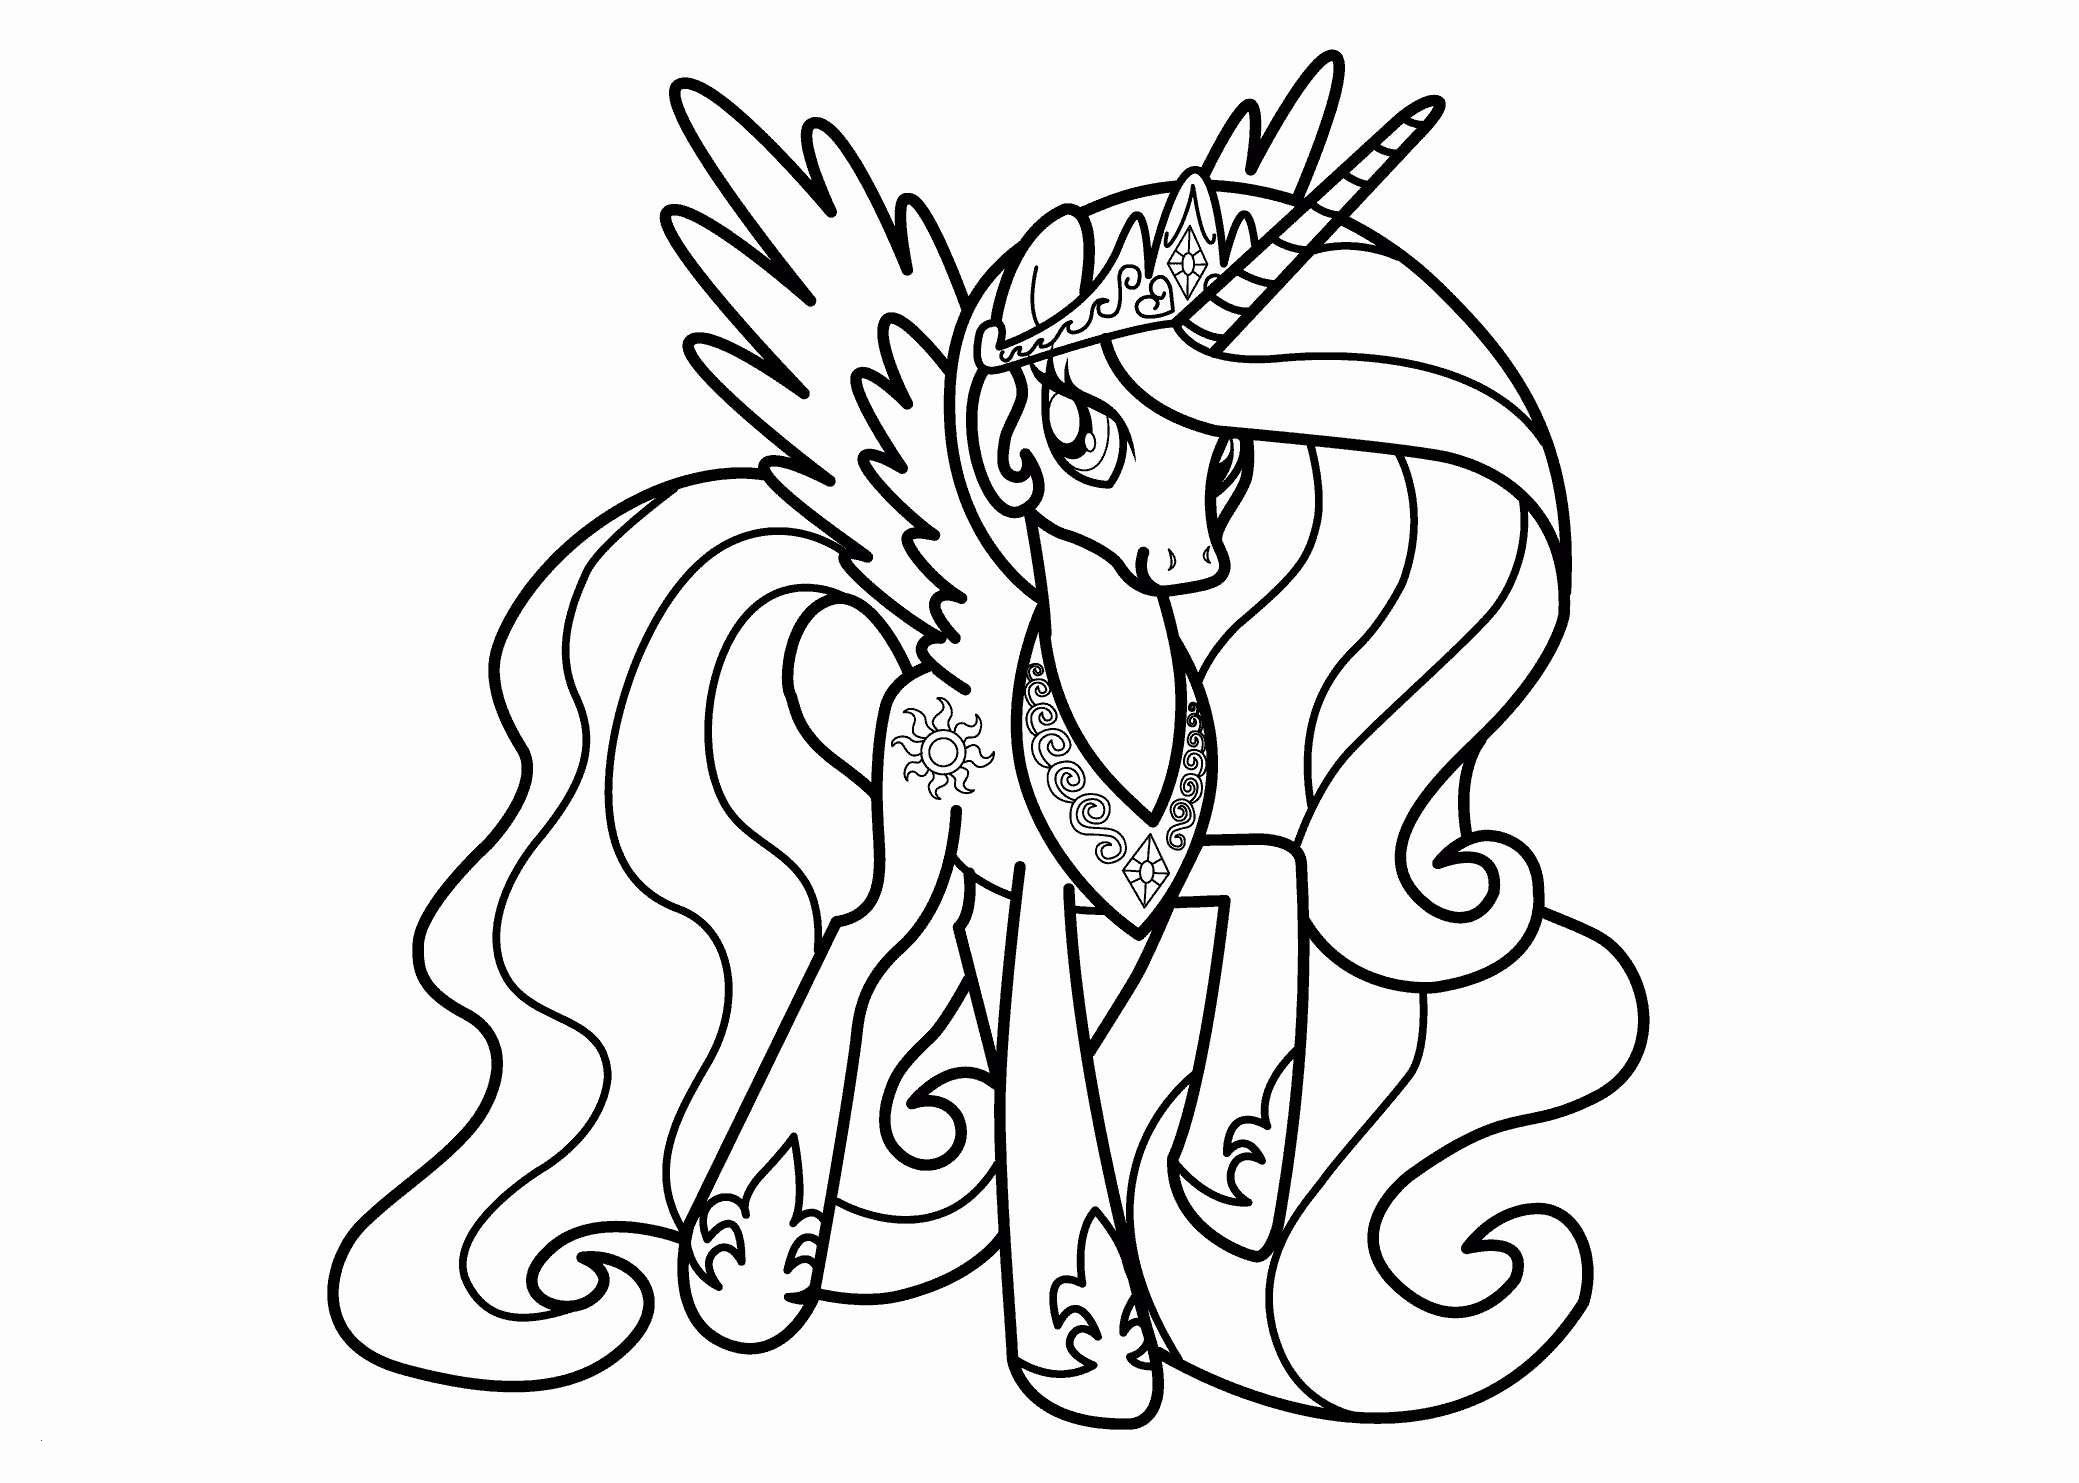 2079x1483 Coloriage My Little Pony Princesse Celestia Ookingatmarystow Us